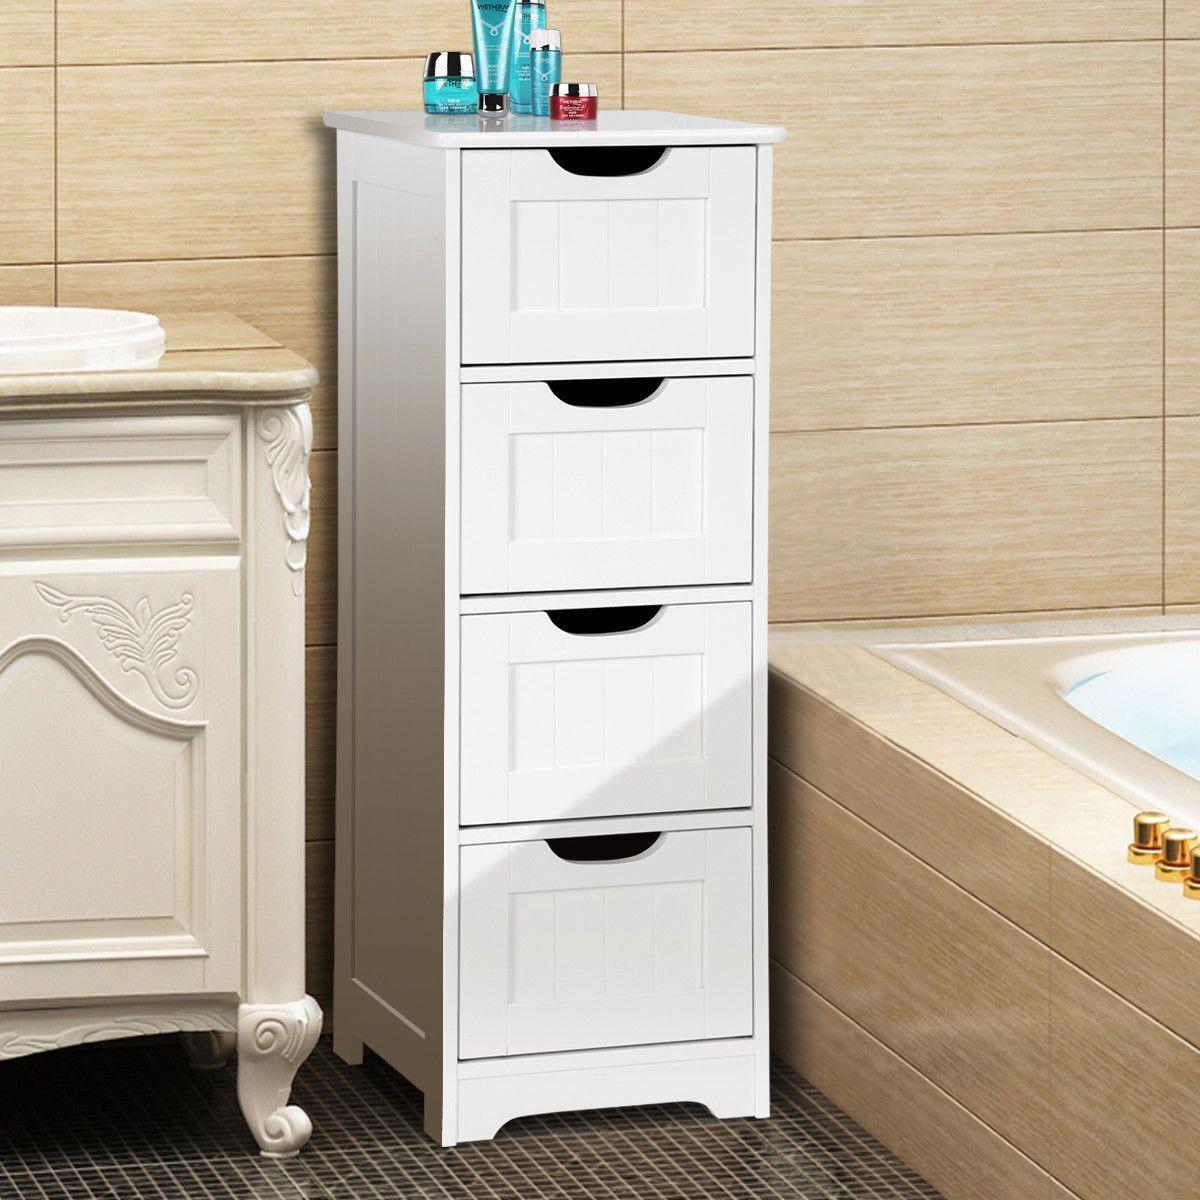 Gymax Bathroom Floor Cabinet Wooden Free Standing Storage Side Organizer W 4 Drawers Walmart Com Bathroom Floor Cabinets Bathroom Storage Cabinet Cupboard Storage [ jpg ]